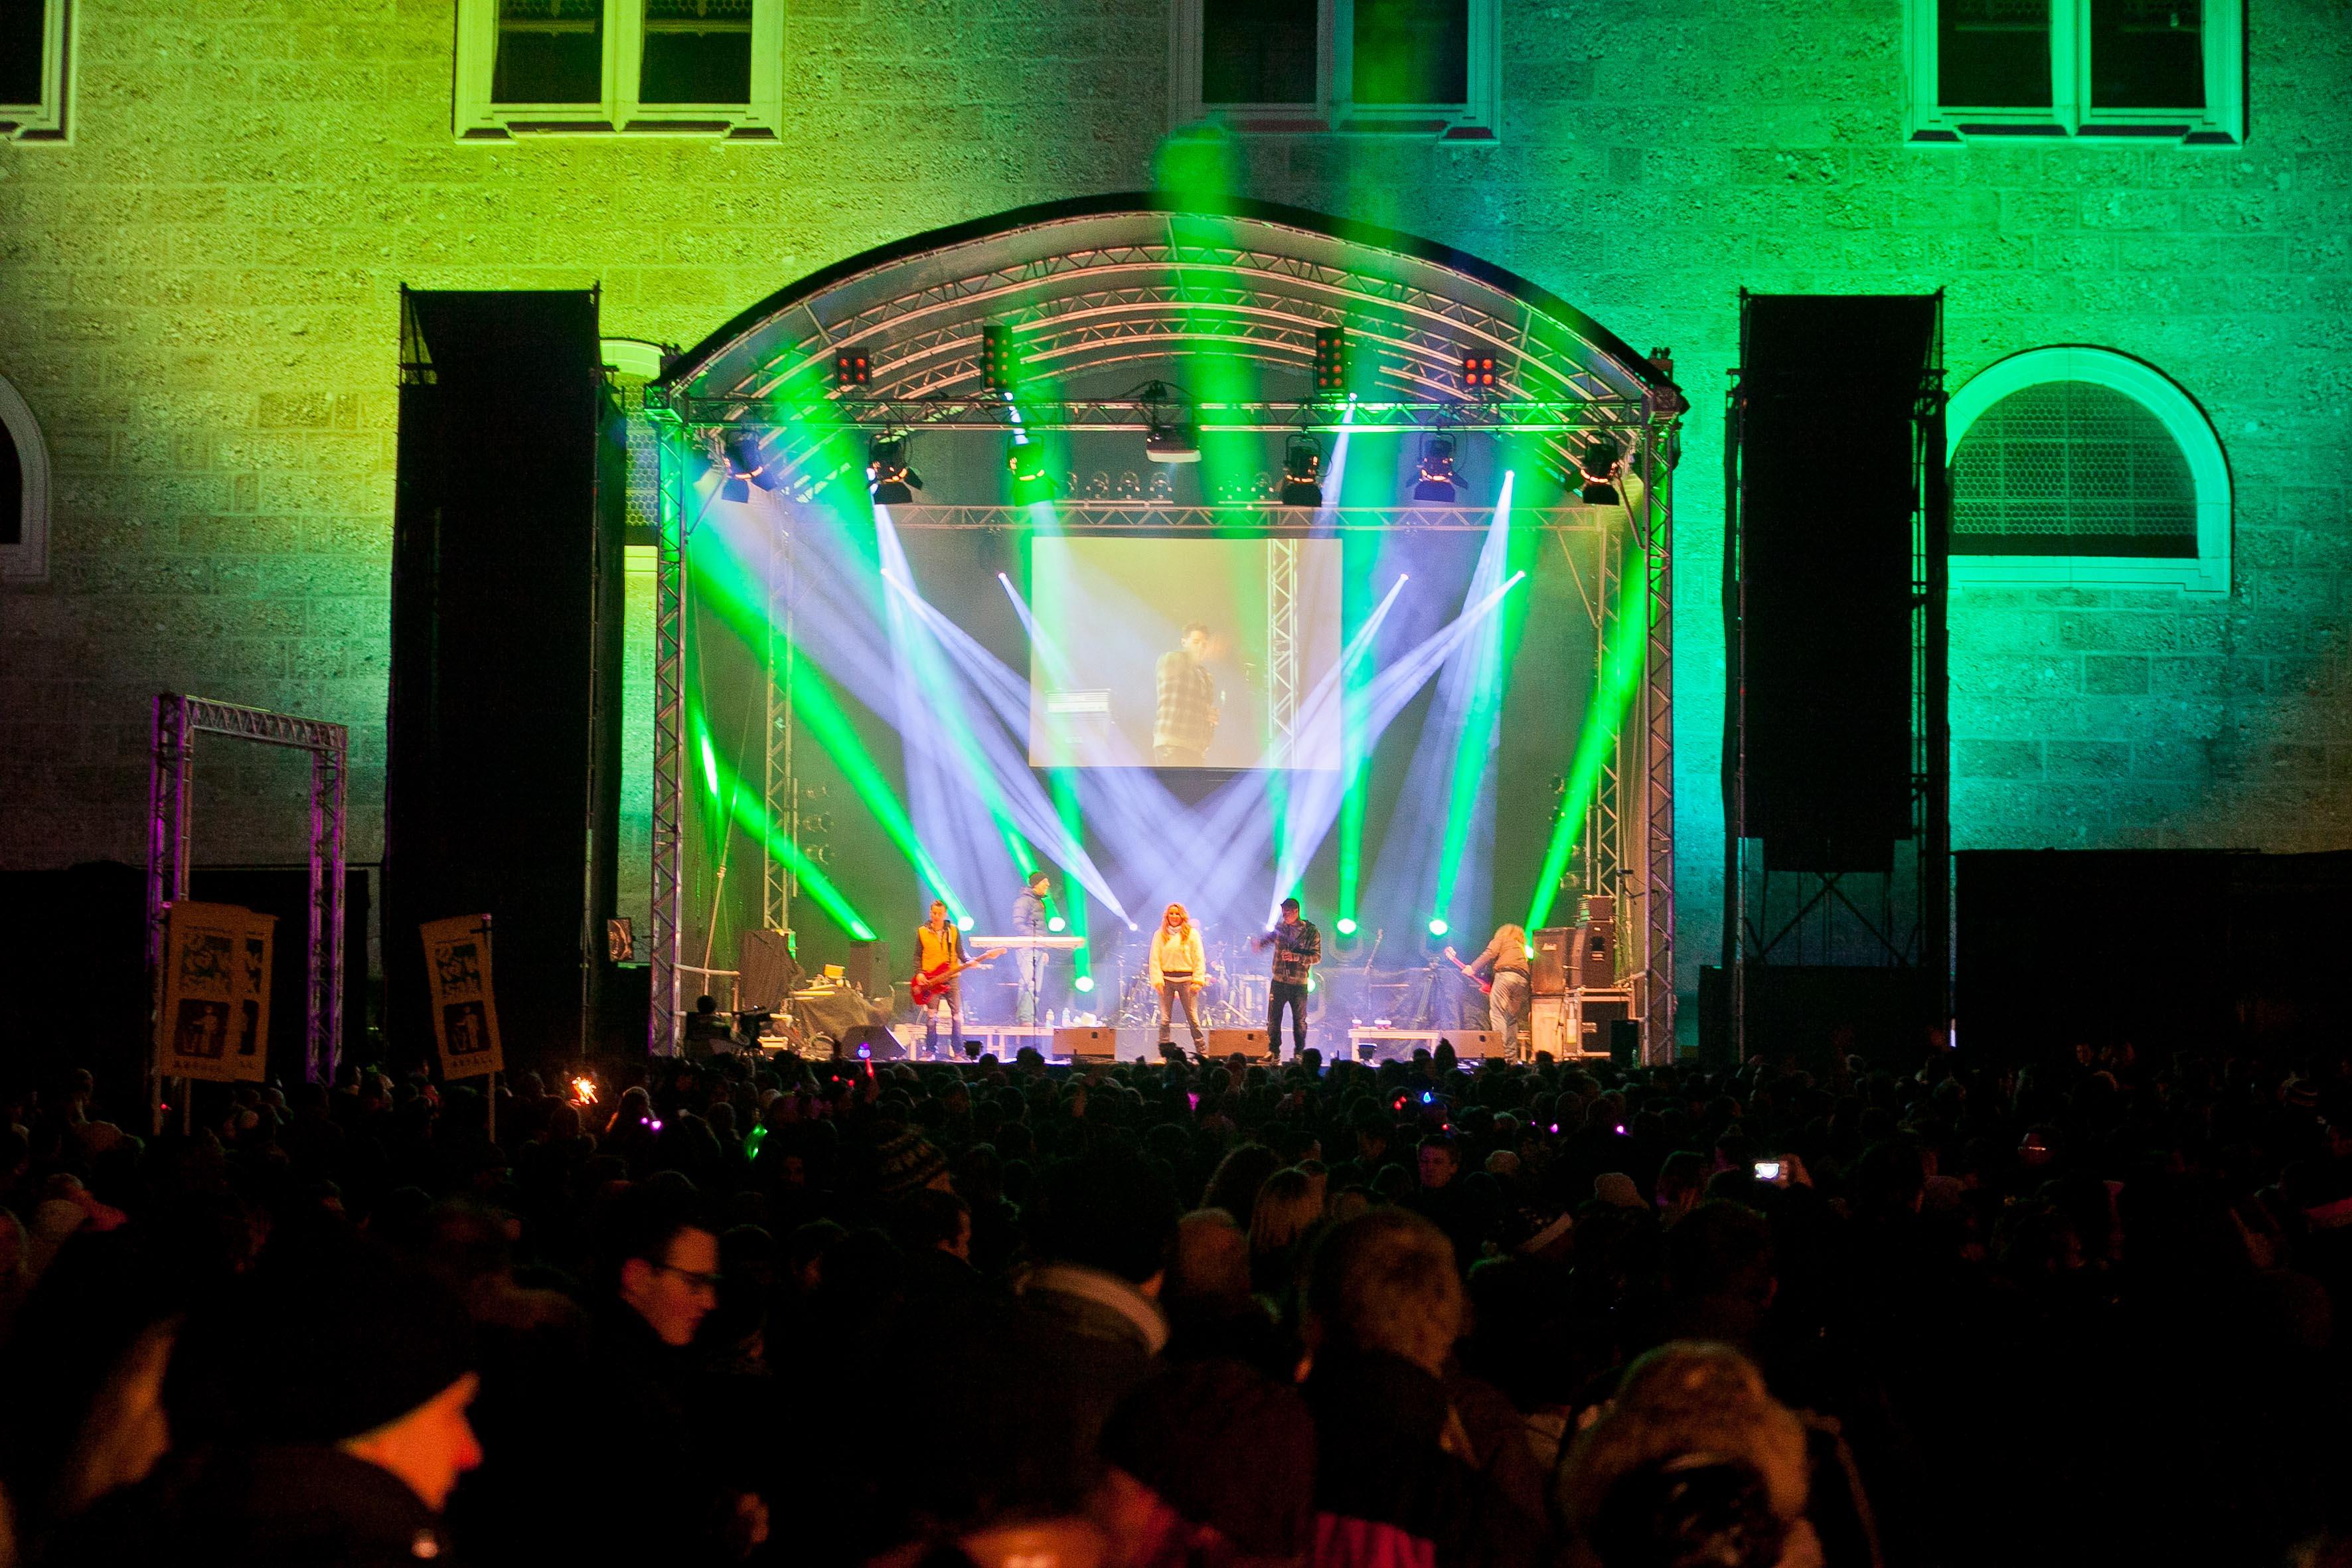 Bühne am Residenzplatz